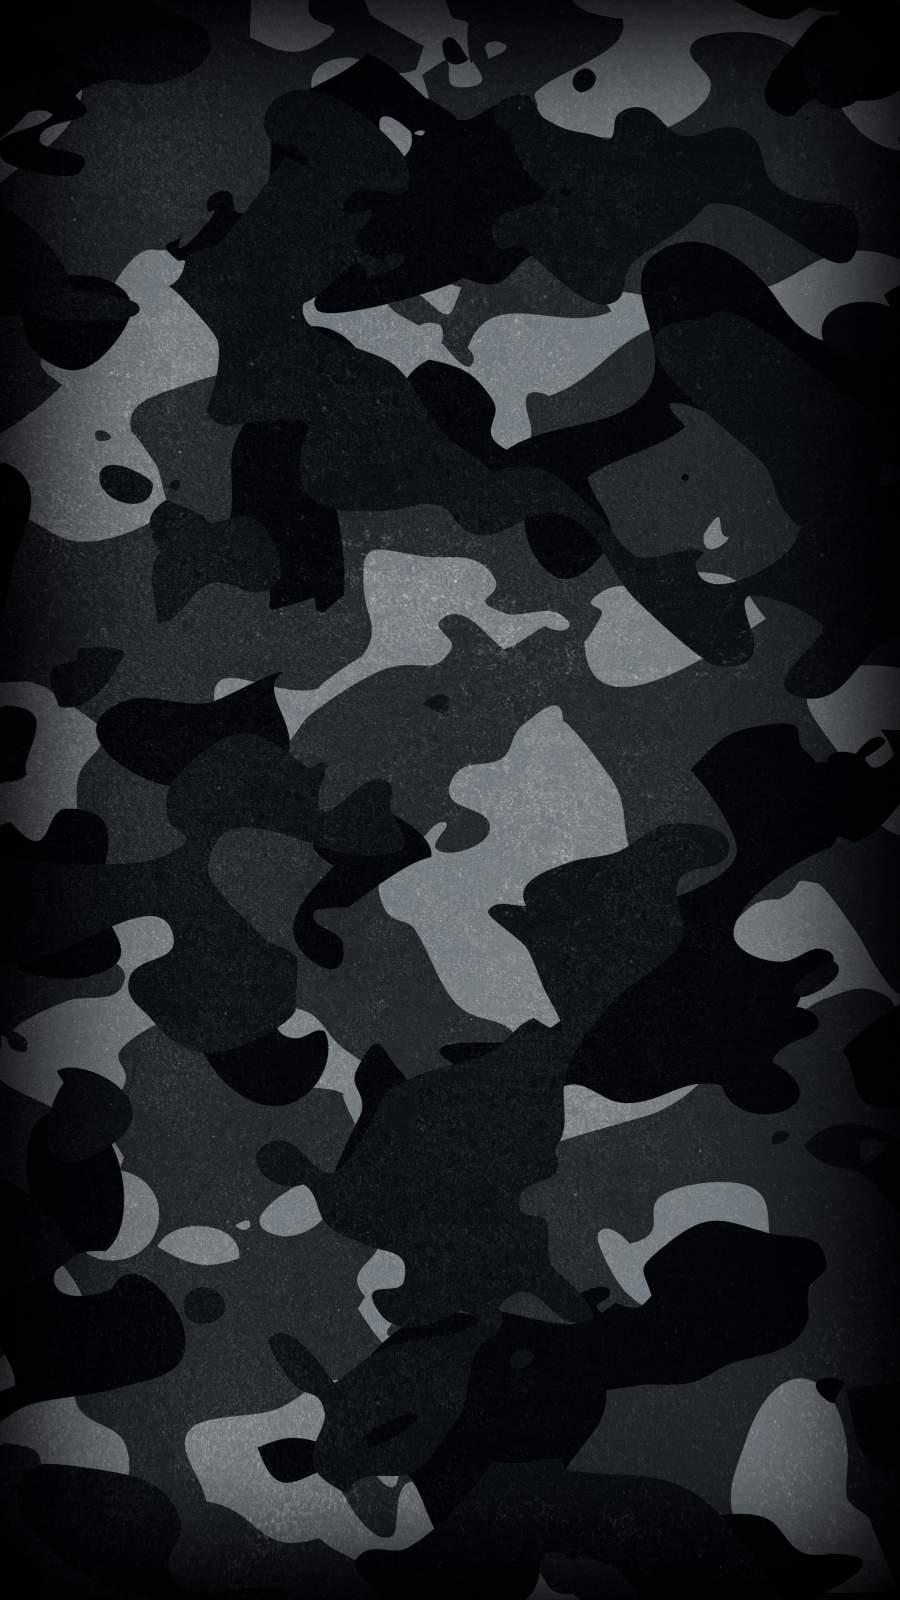 Dark Camouflage iPhone Wallpaper